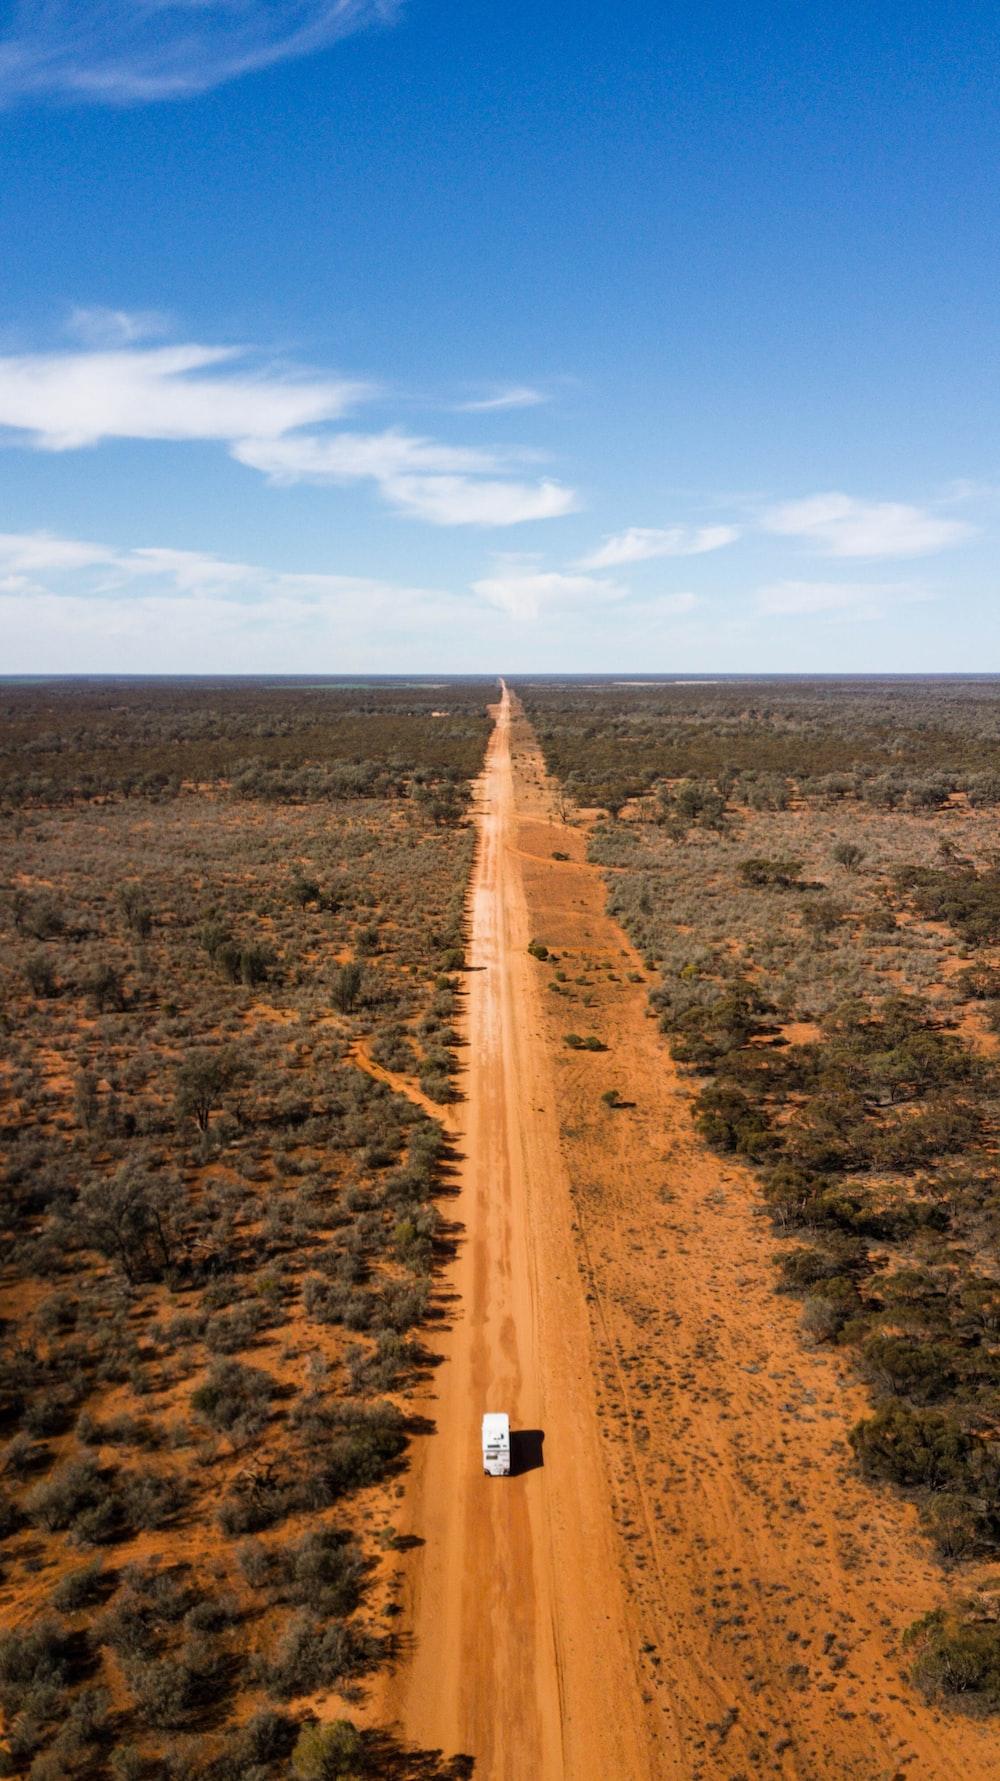 brown dirt road between green grass field under blue sky during daytime